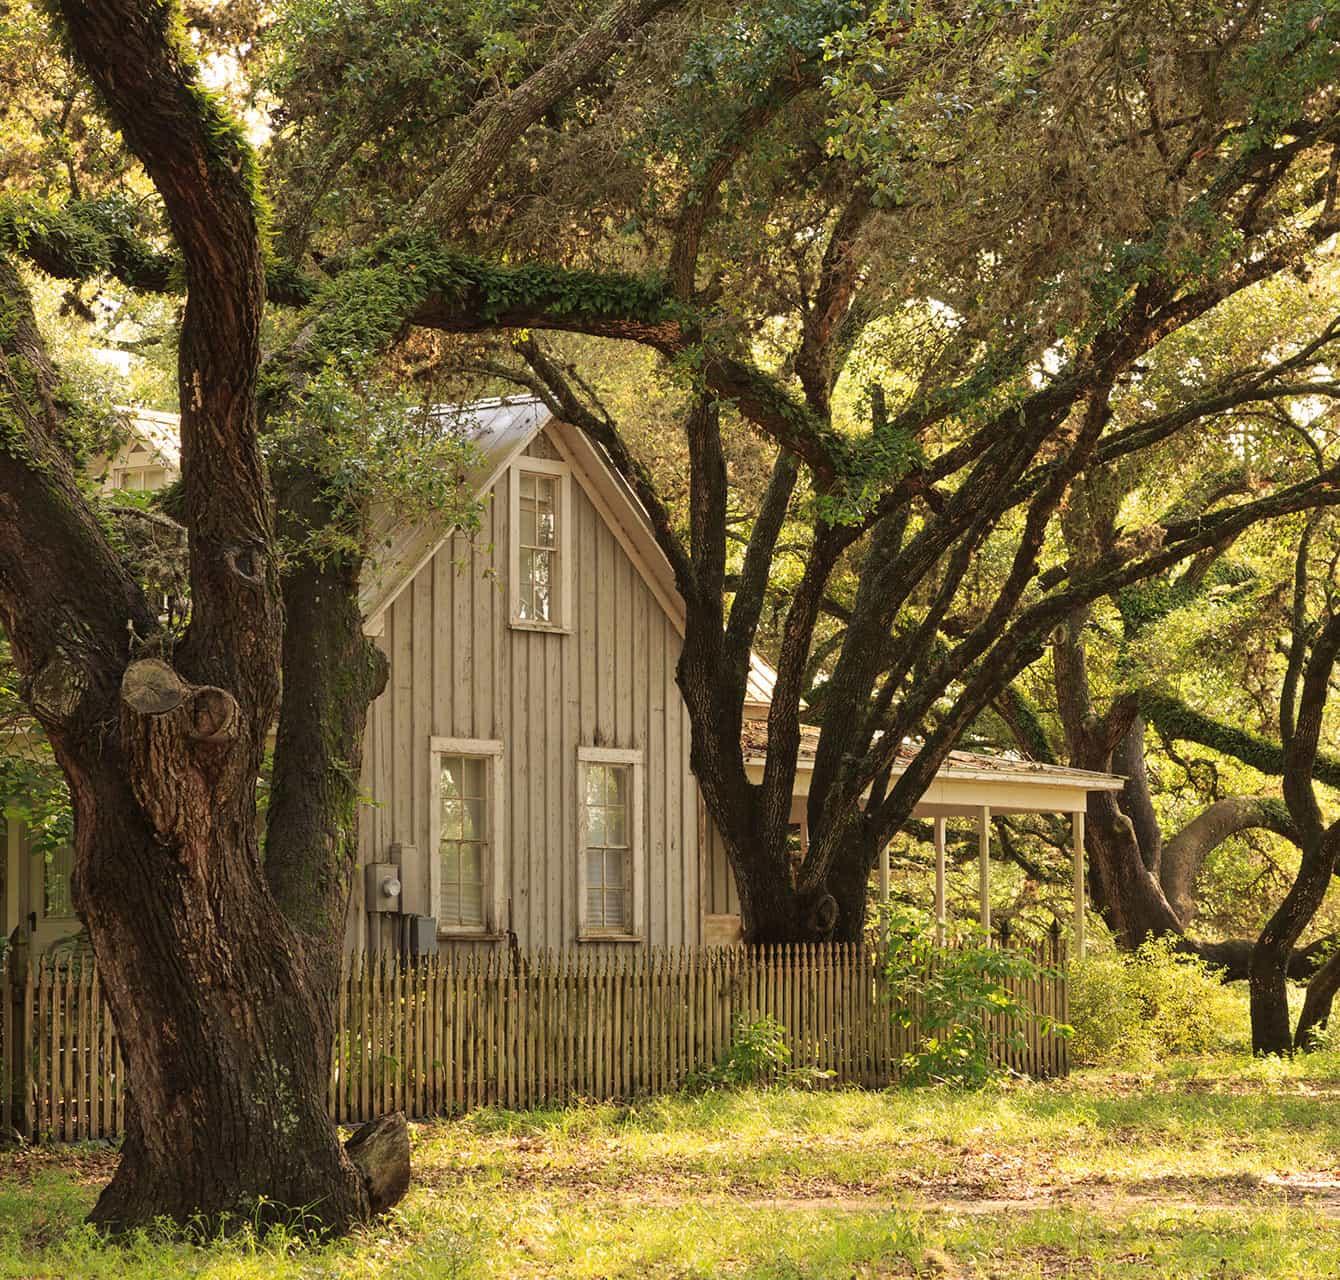 Exterior of Texas Farmhouse with Trees